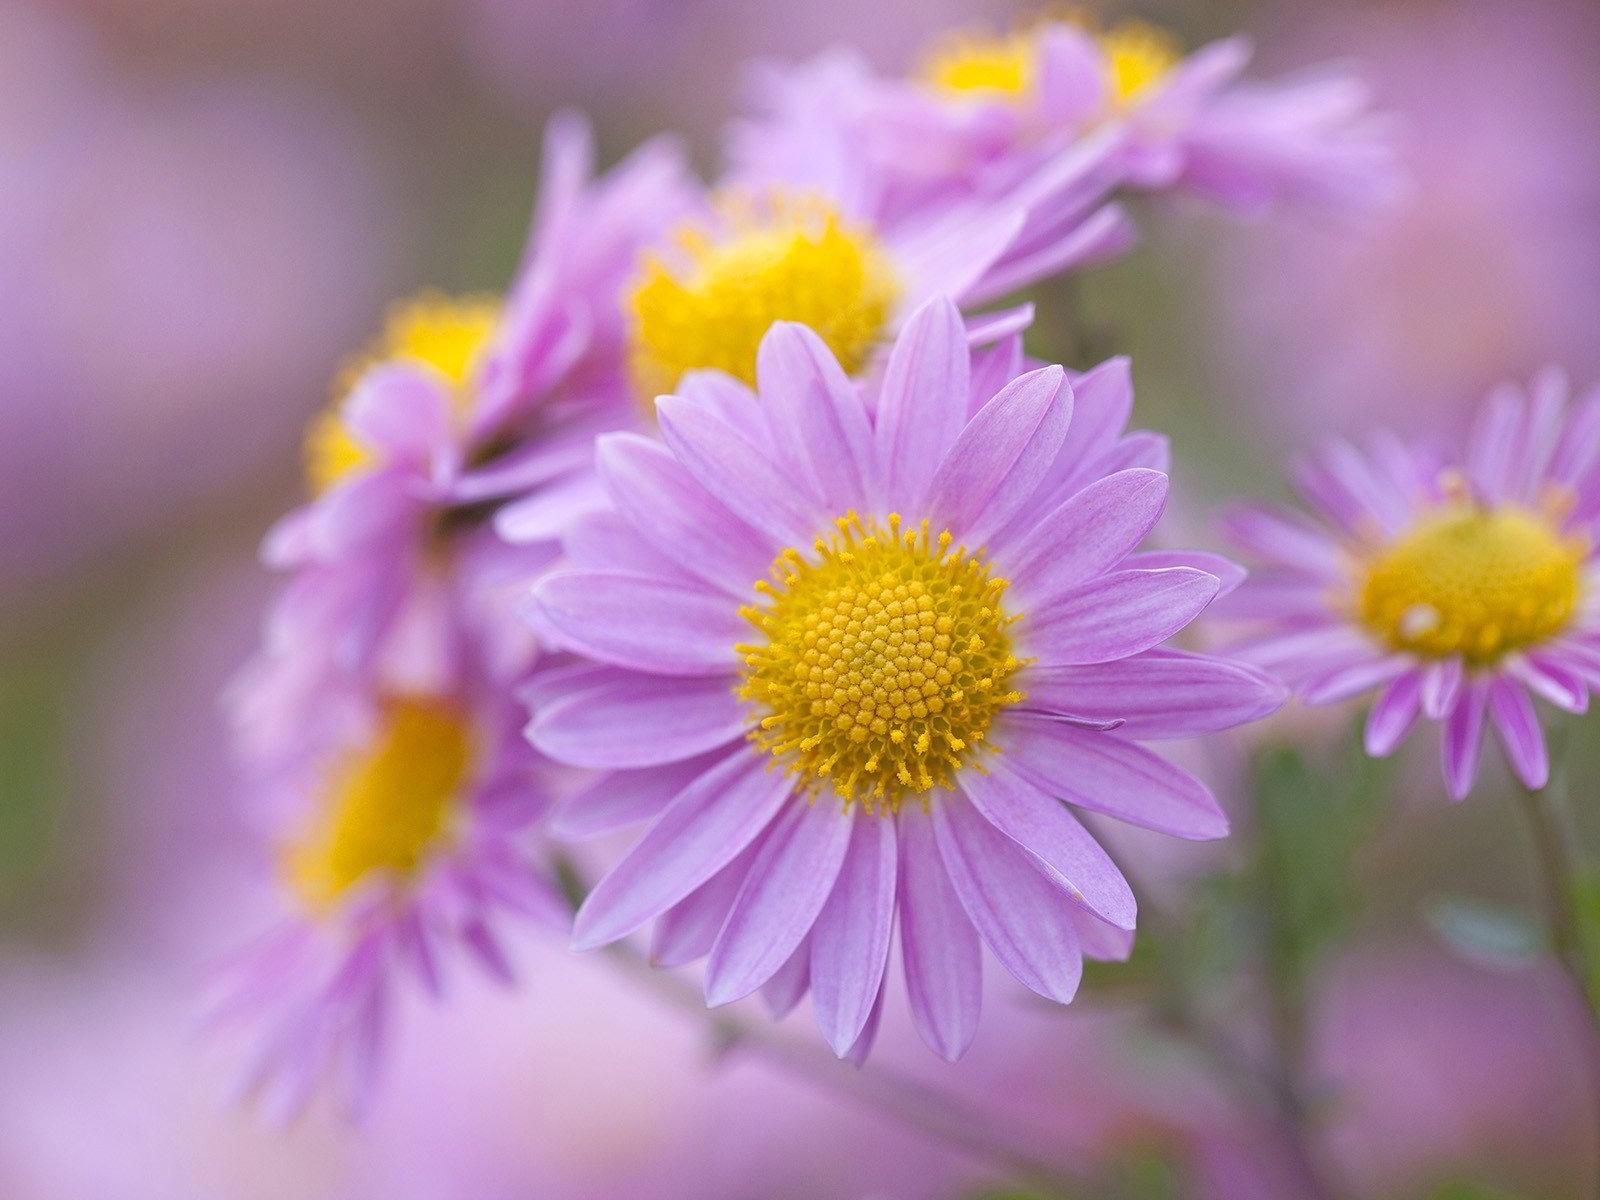 hinh anh hoa cuc dep 26